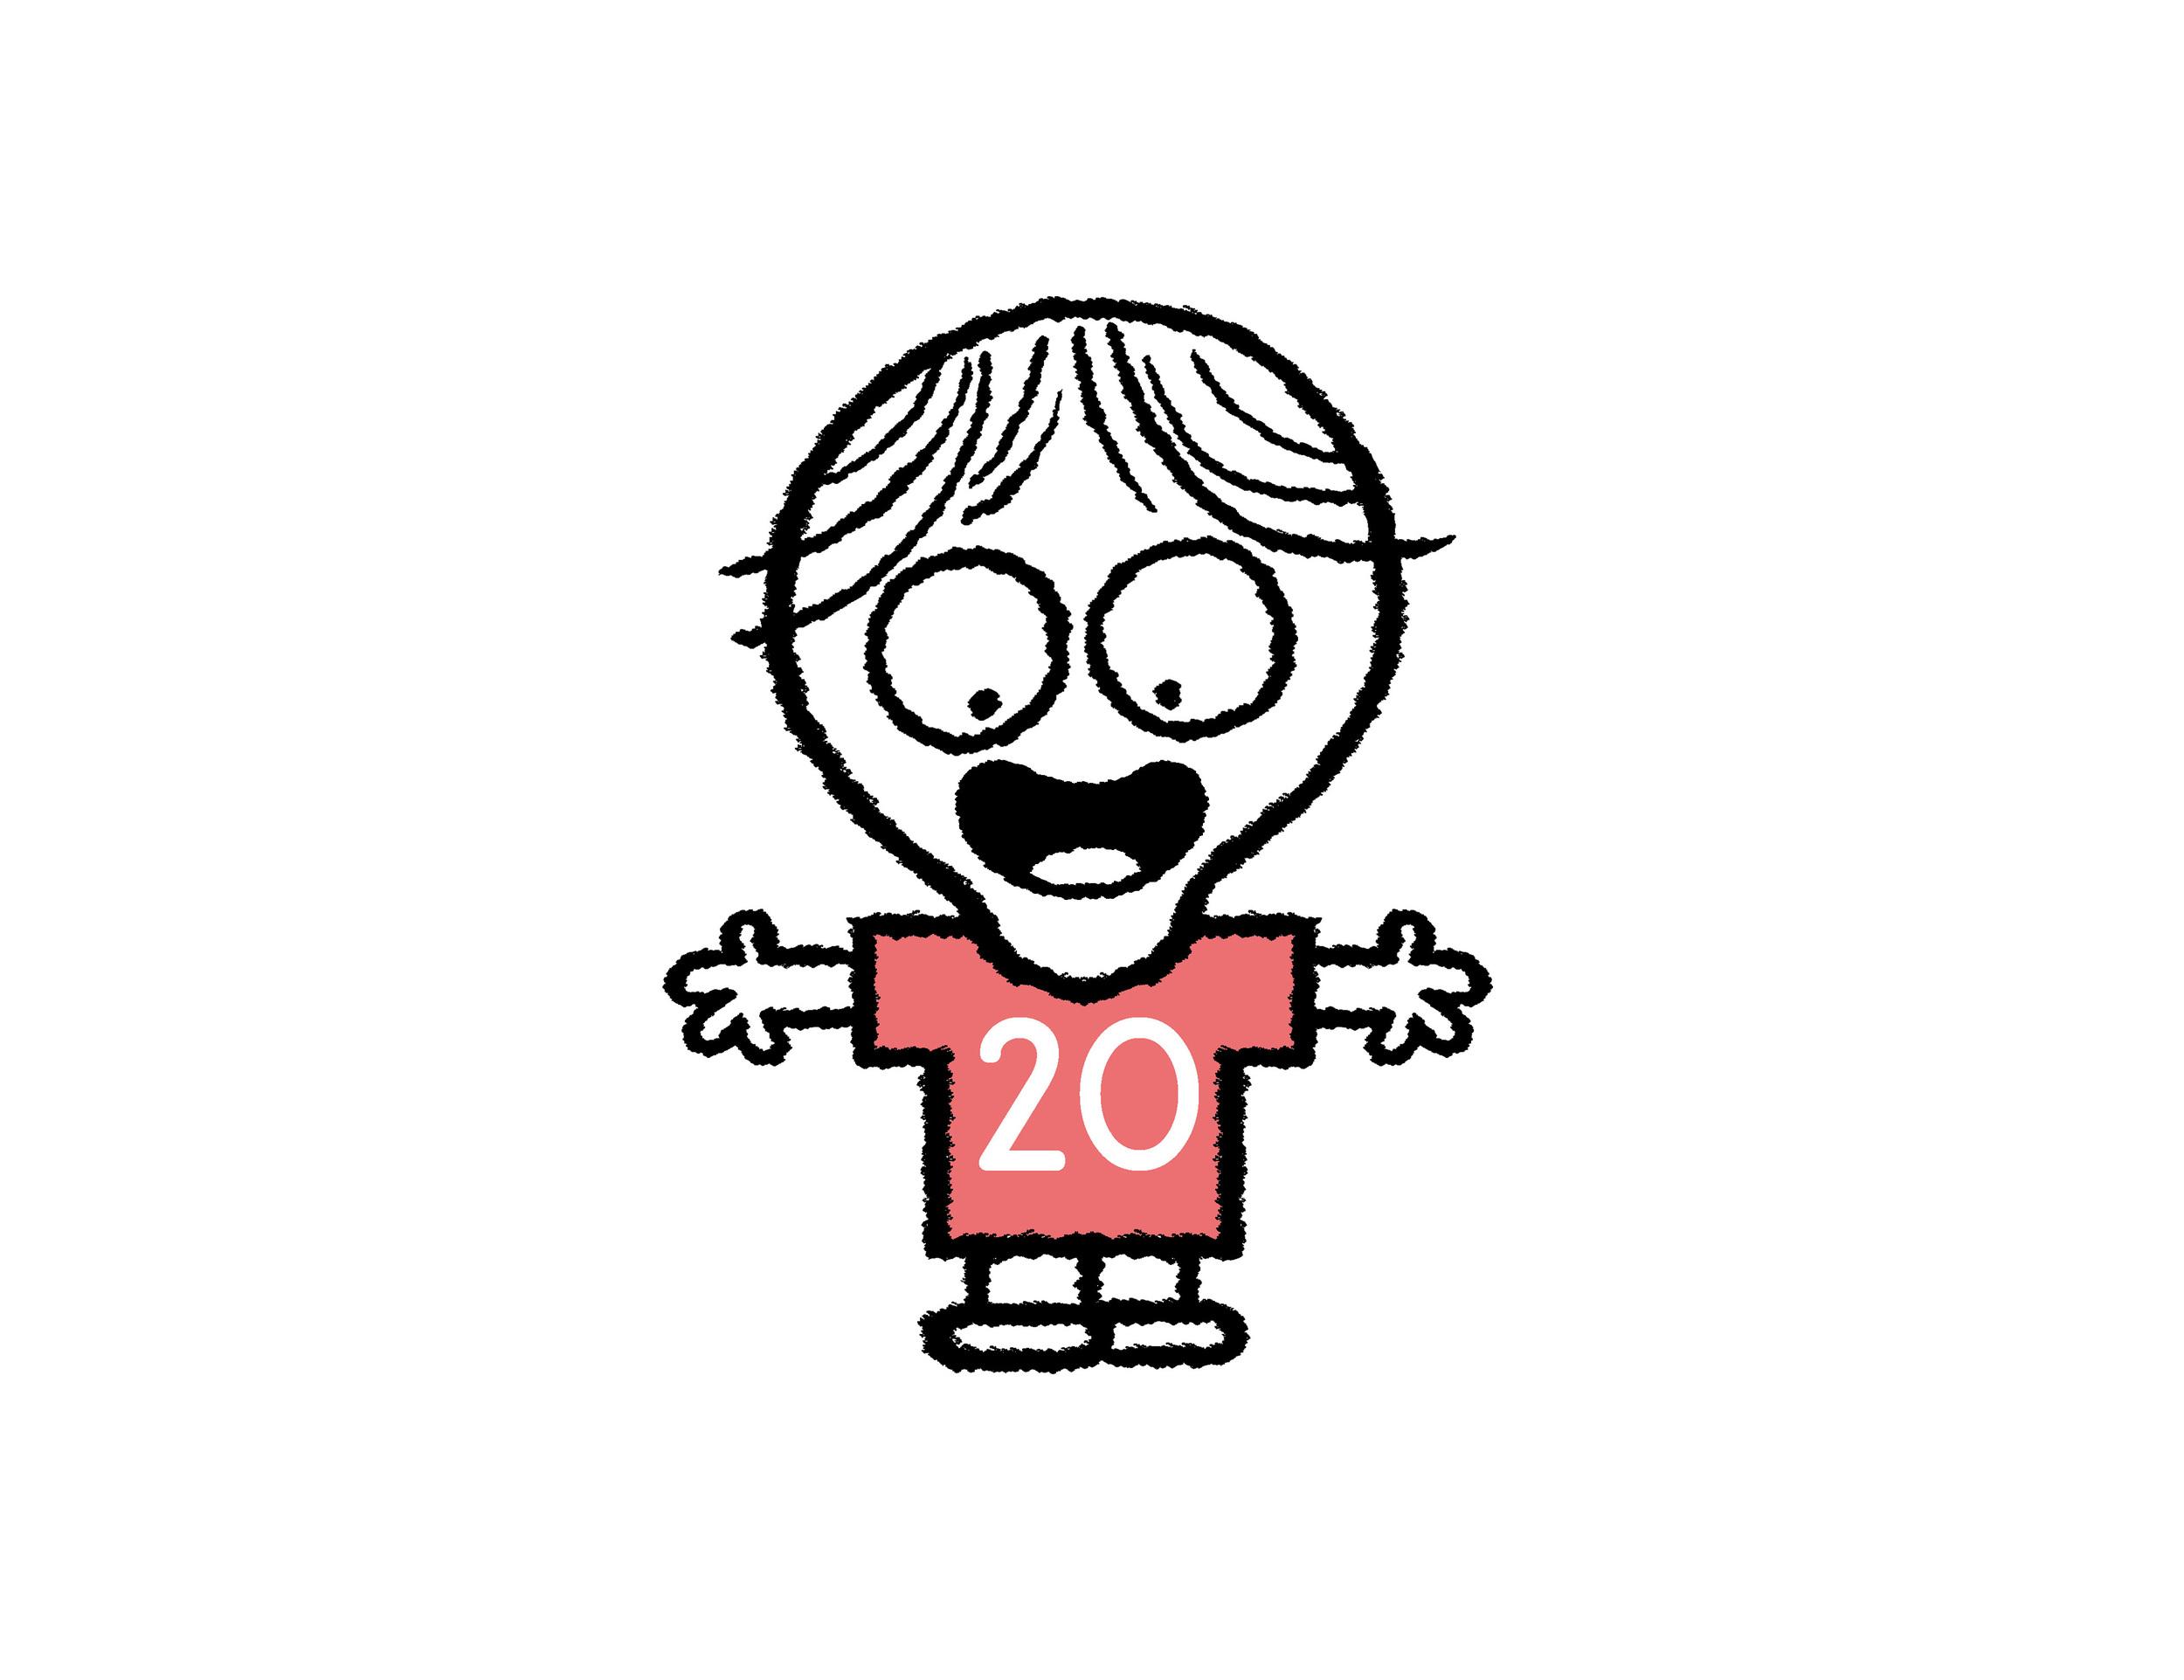 Number_20_A.jpg